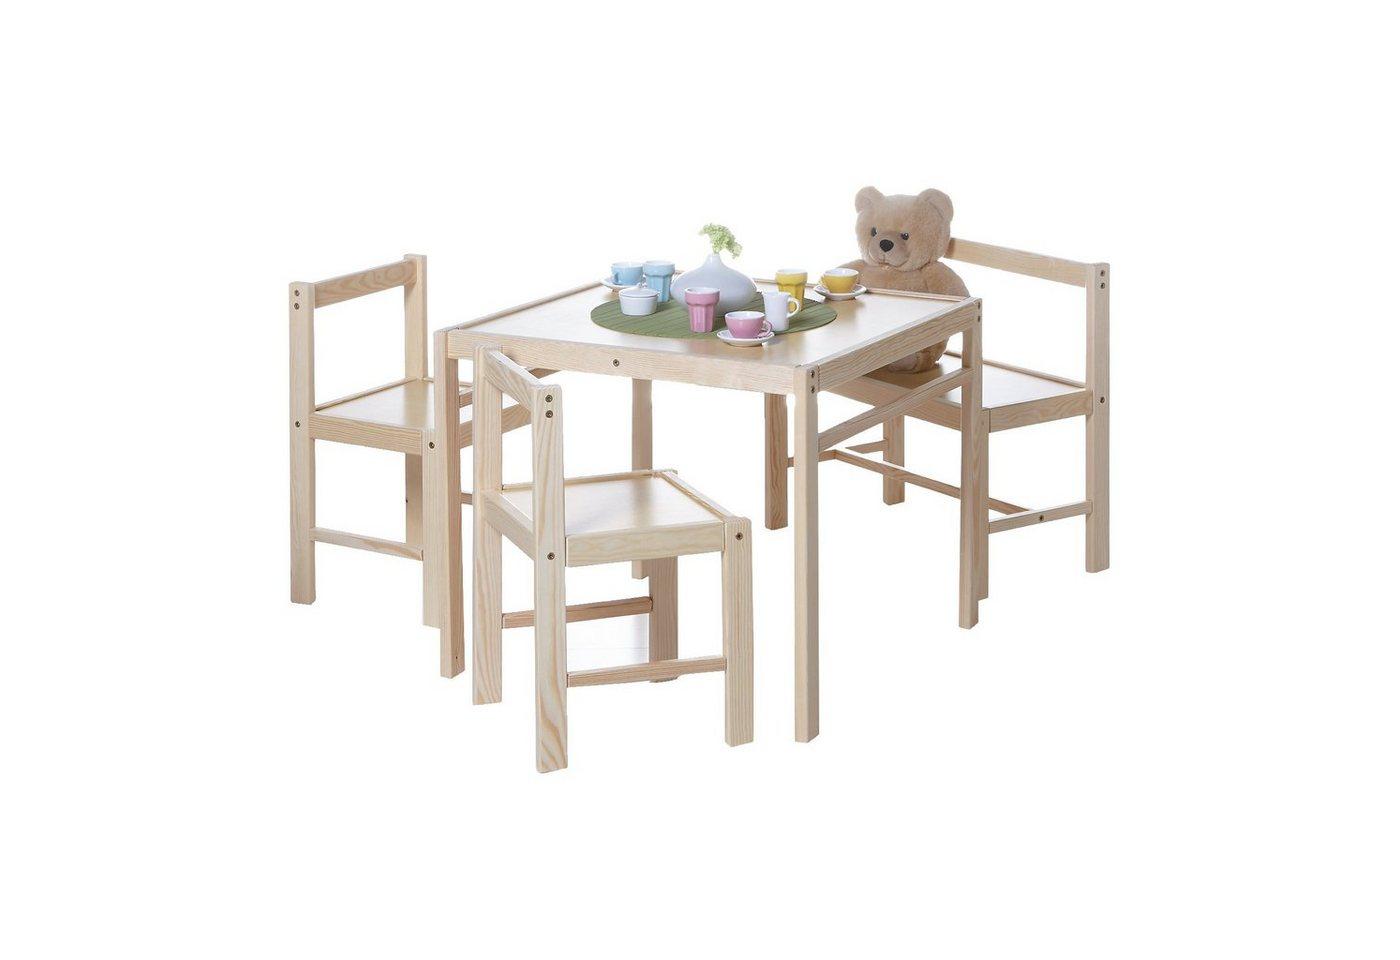 Sitzmöbel - Ticaa Kindersitzgruppe Kindertisch 4 teilig Kiefer massiv  - Onlineshop OTTO